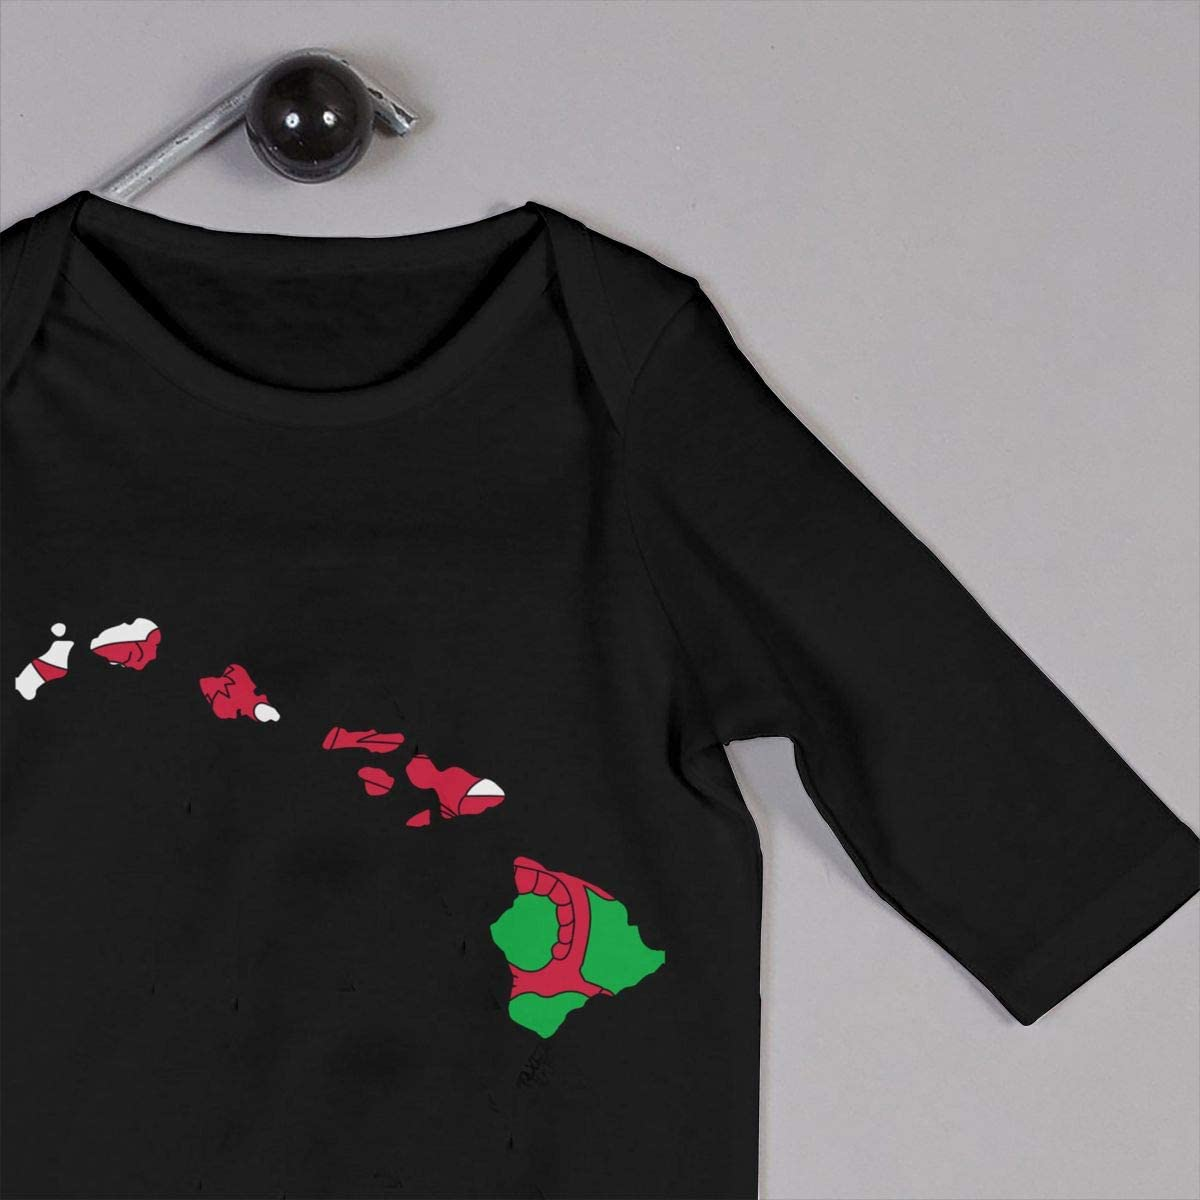 YELTY6F Hawaii Map Welsh Flag Printed Boys Girls Jumpsuit Long Sleeve Romper Black